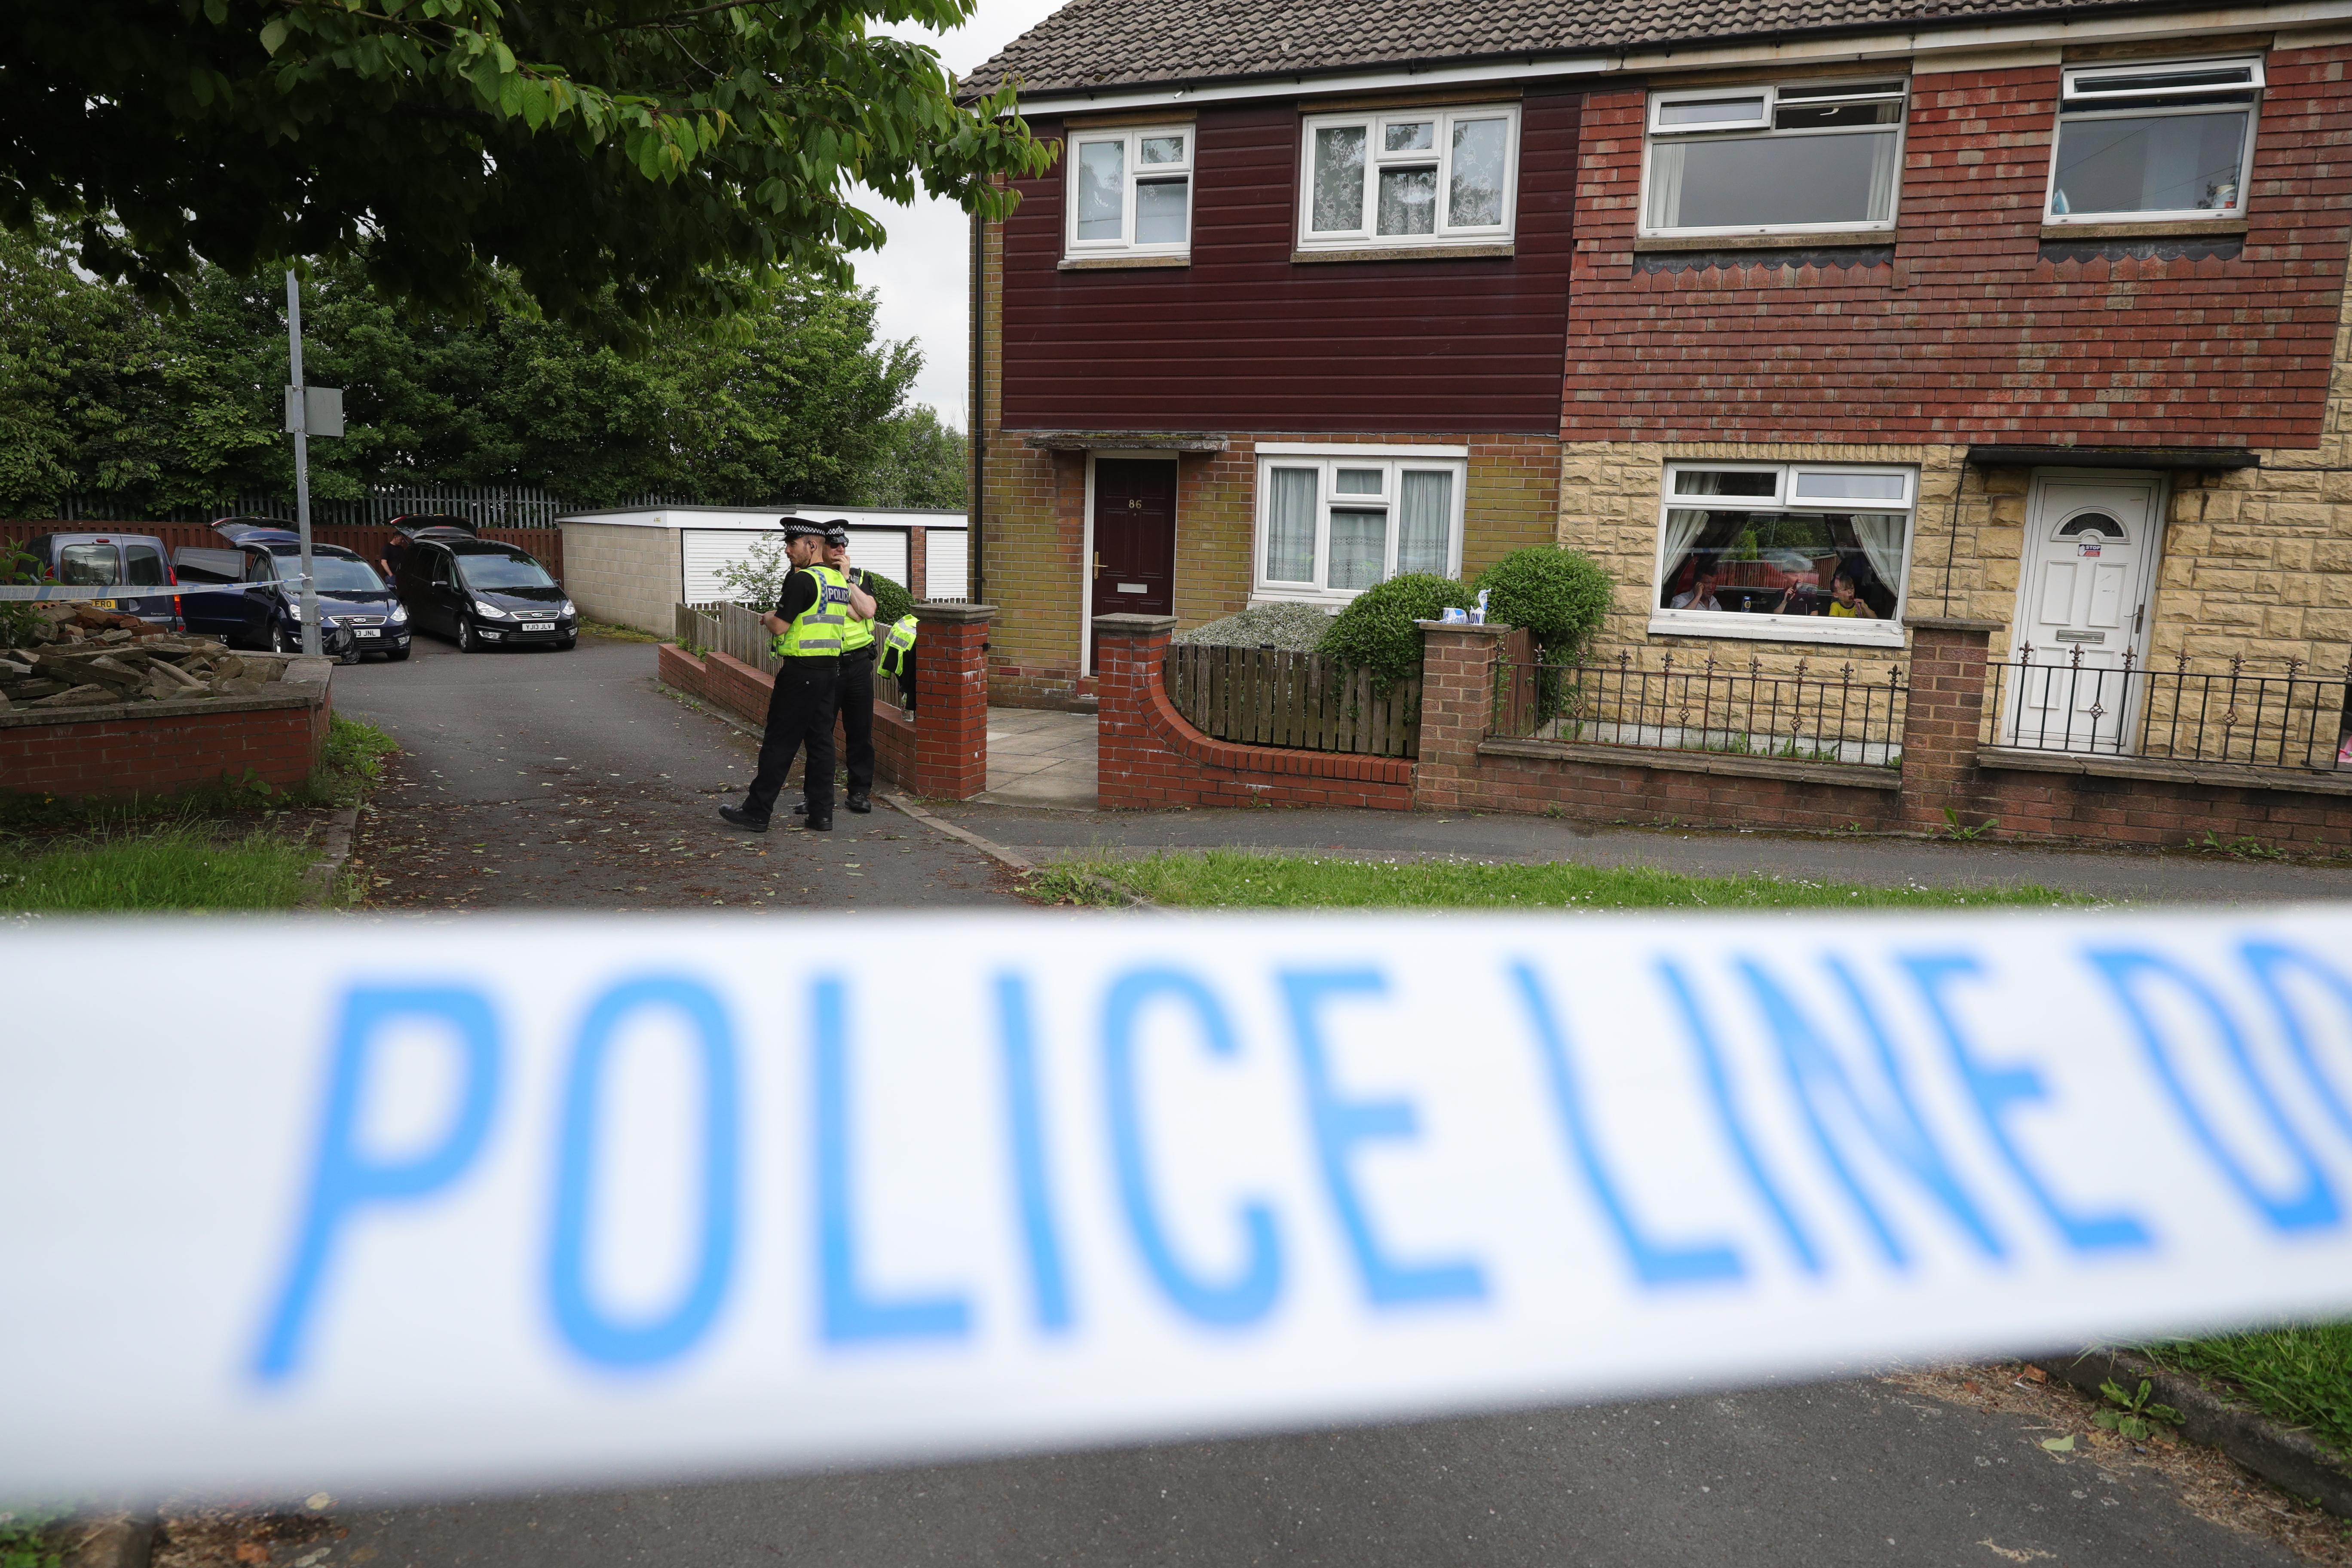 Birstall MP Jo Cox Killed In Shooting